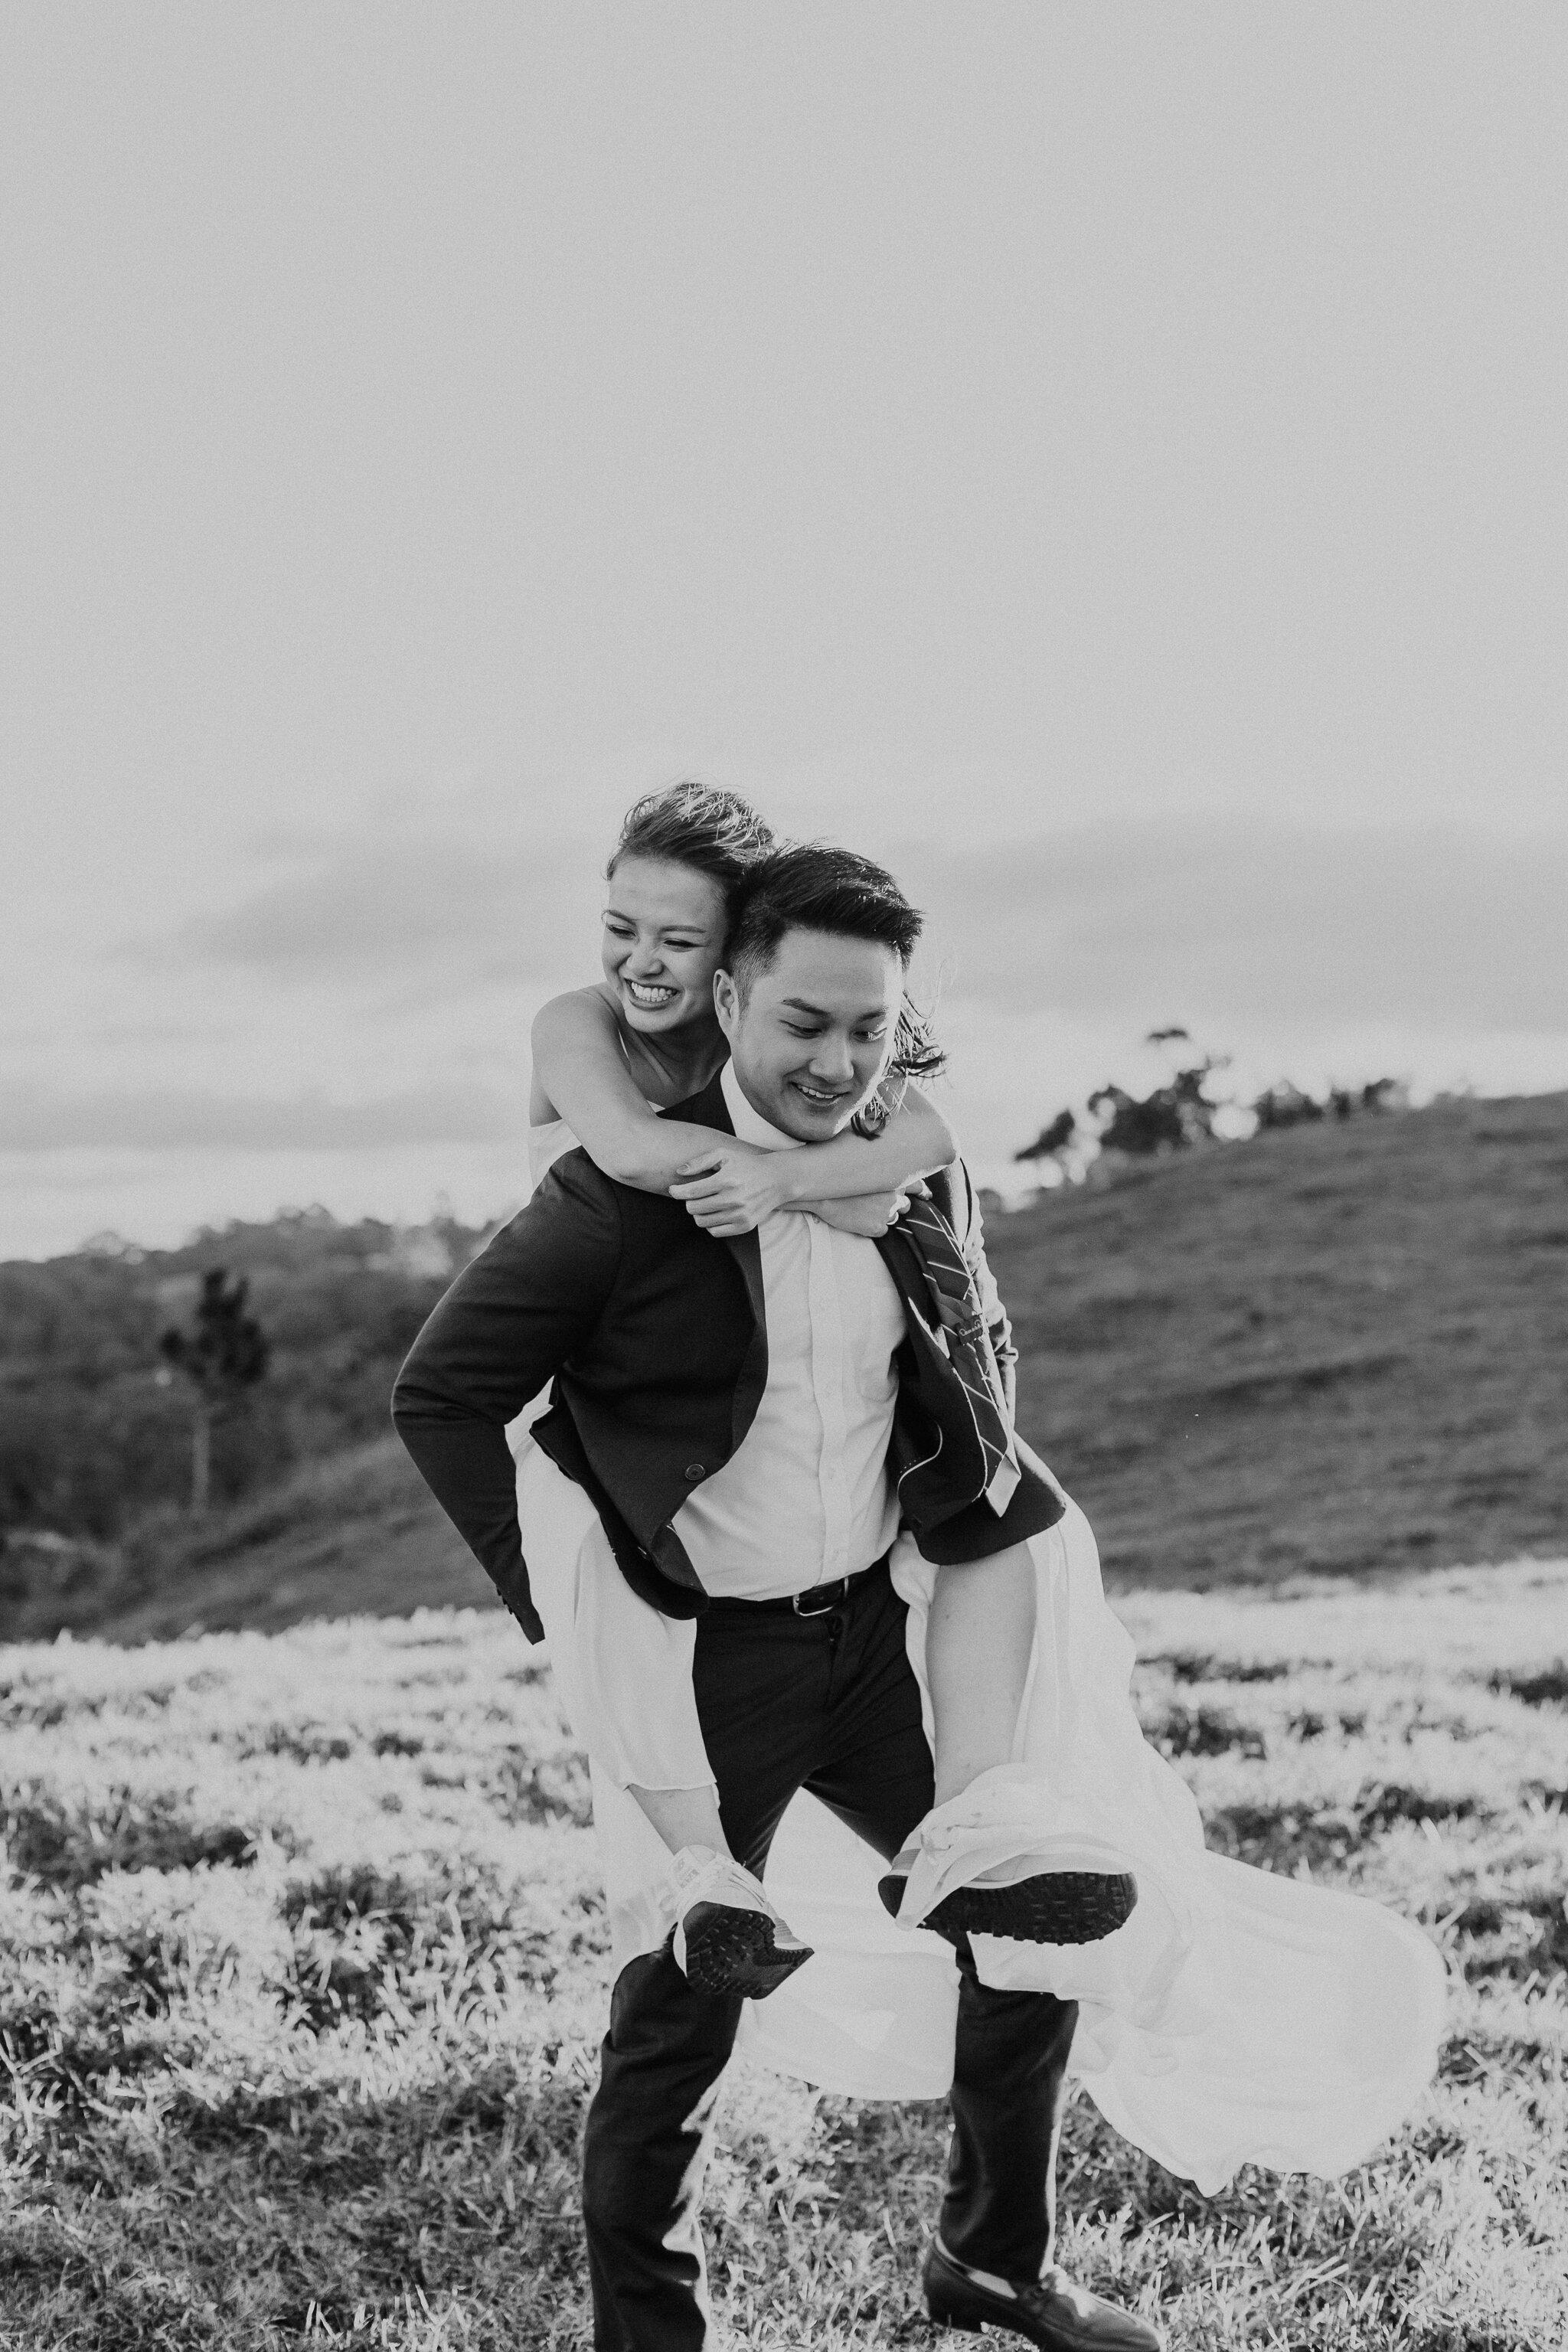 Maleny One Tree Hill Wedding - Maleny Wedding Photographer-12.jpg